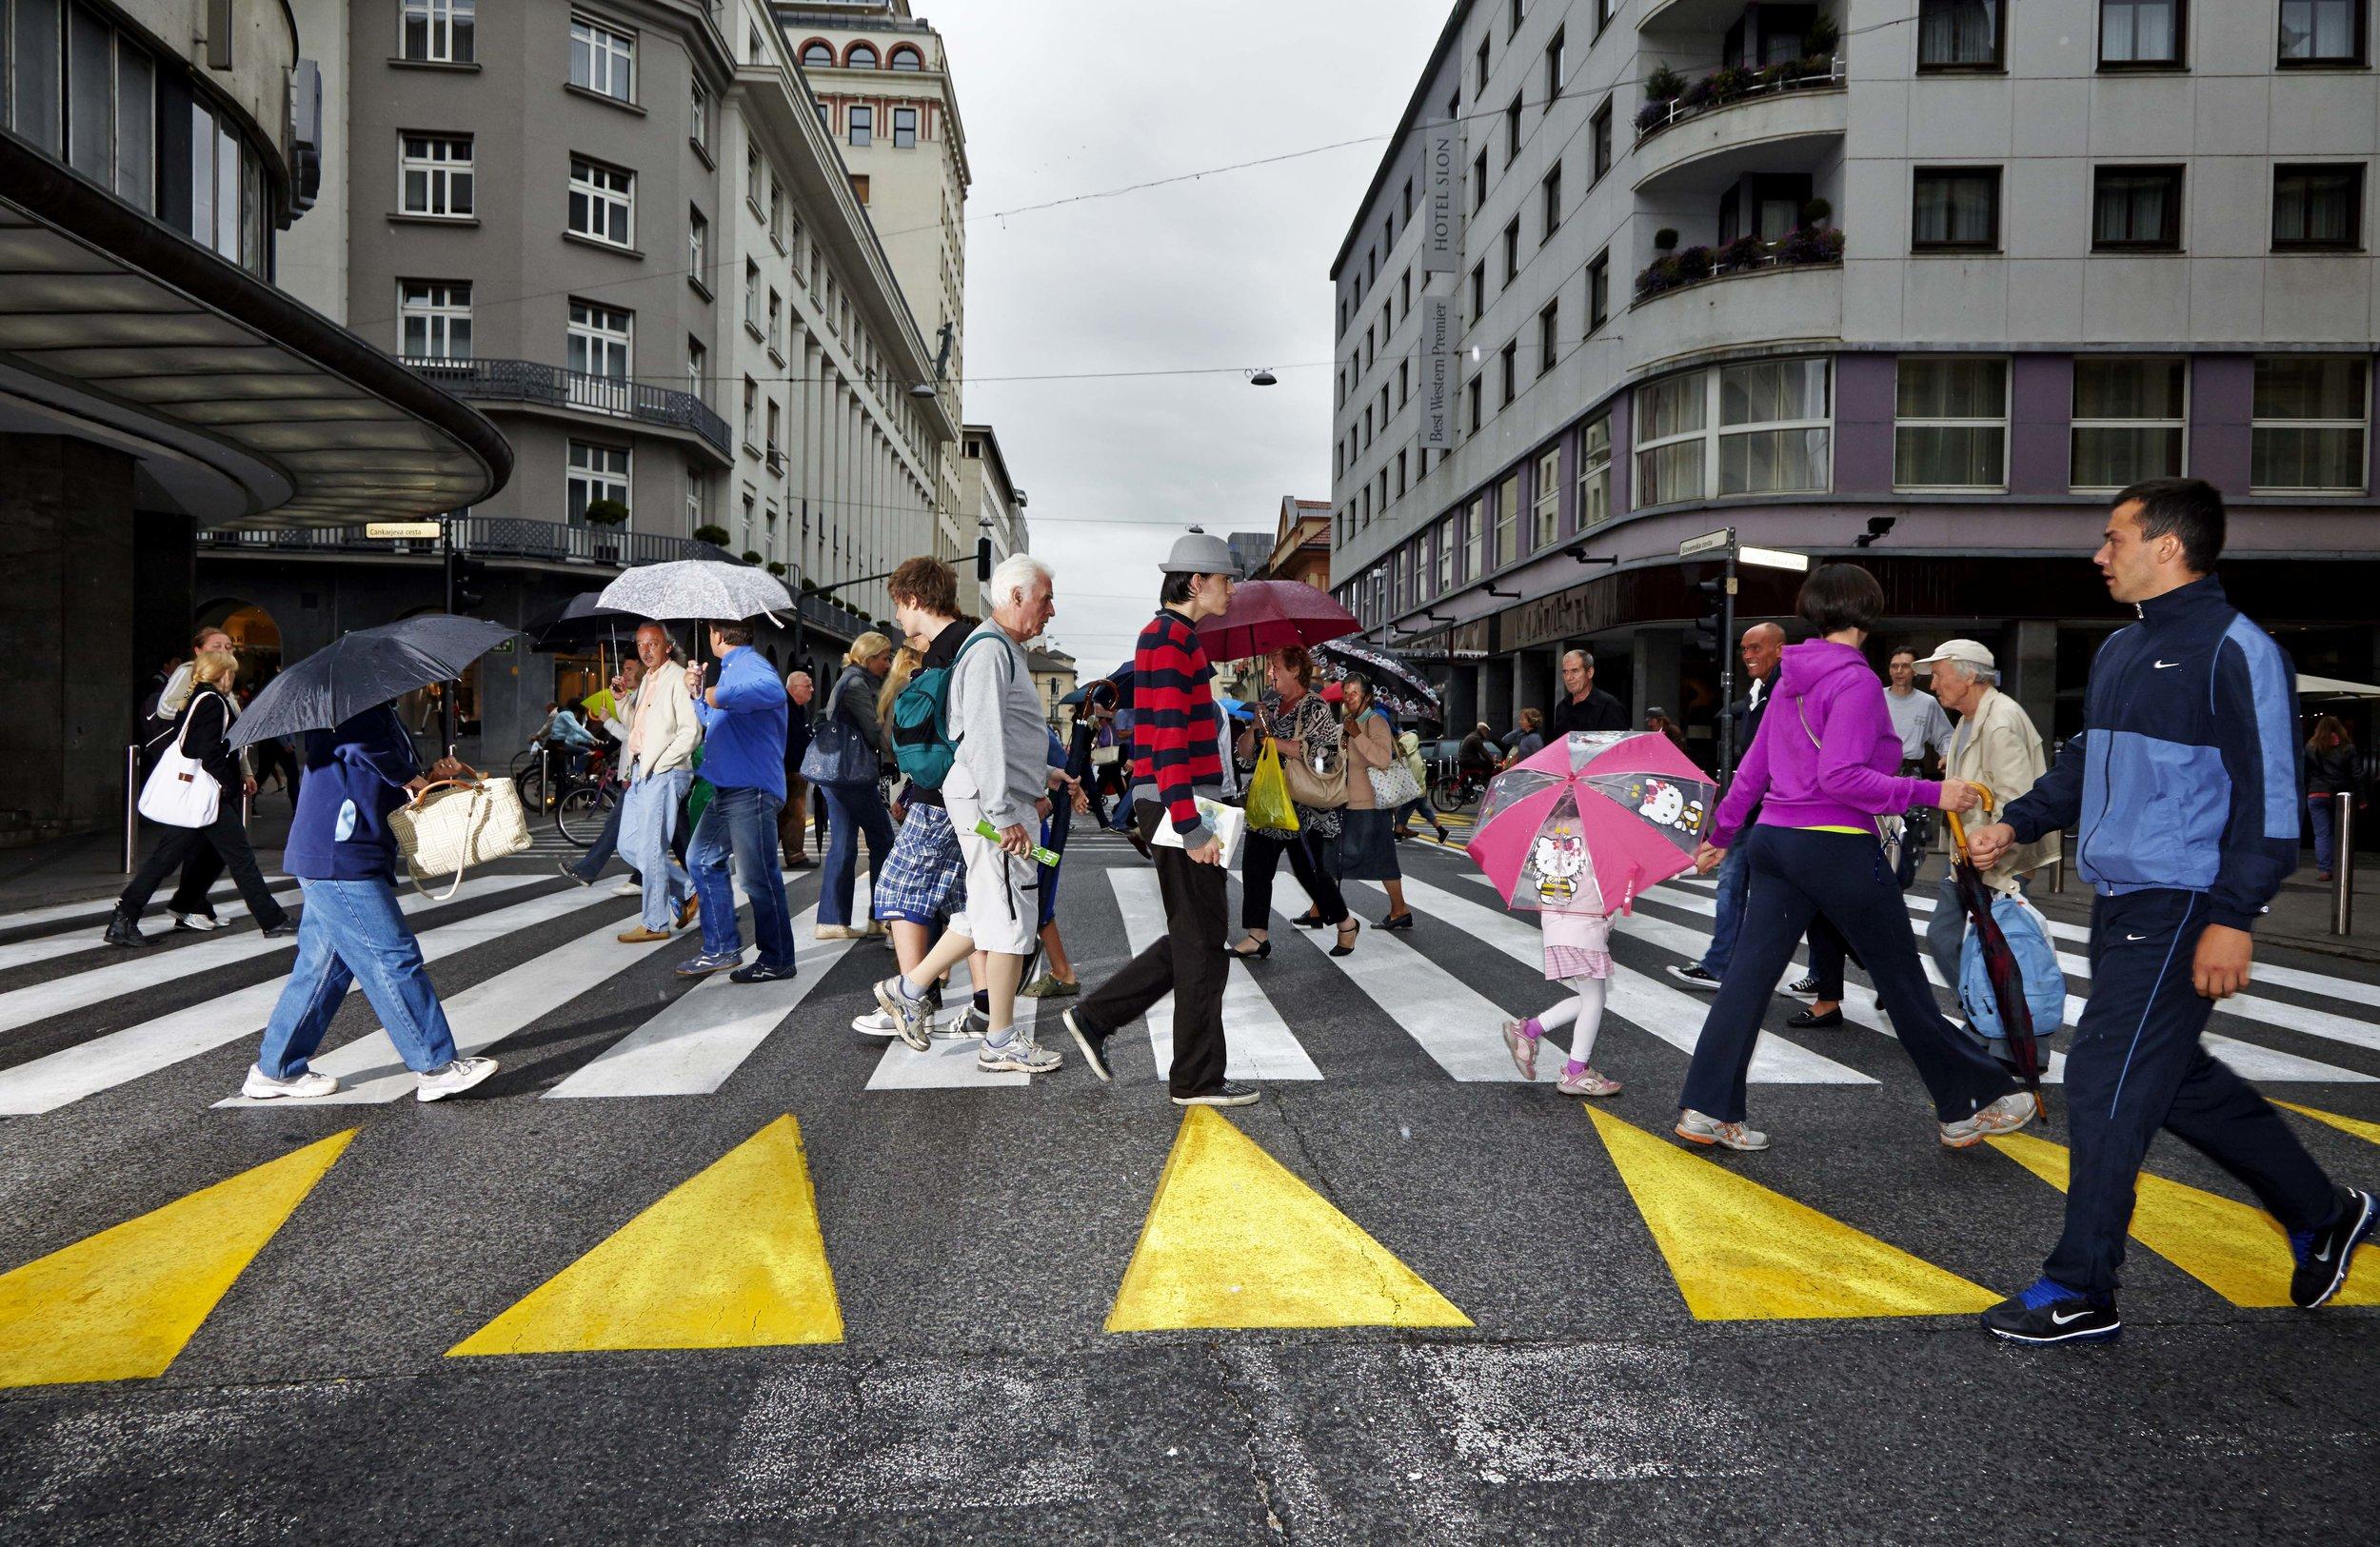 Ljubljana_Slovenia_Crossing_Europe_Poike Stomps_2012_MG_5767.jpg